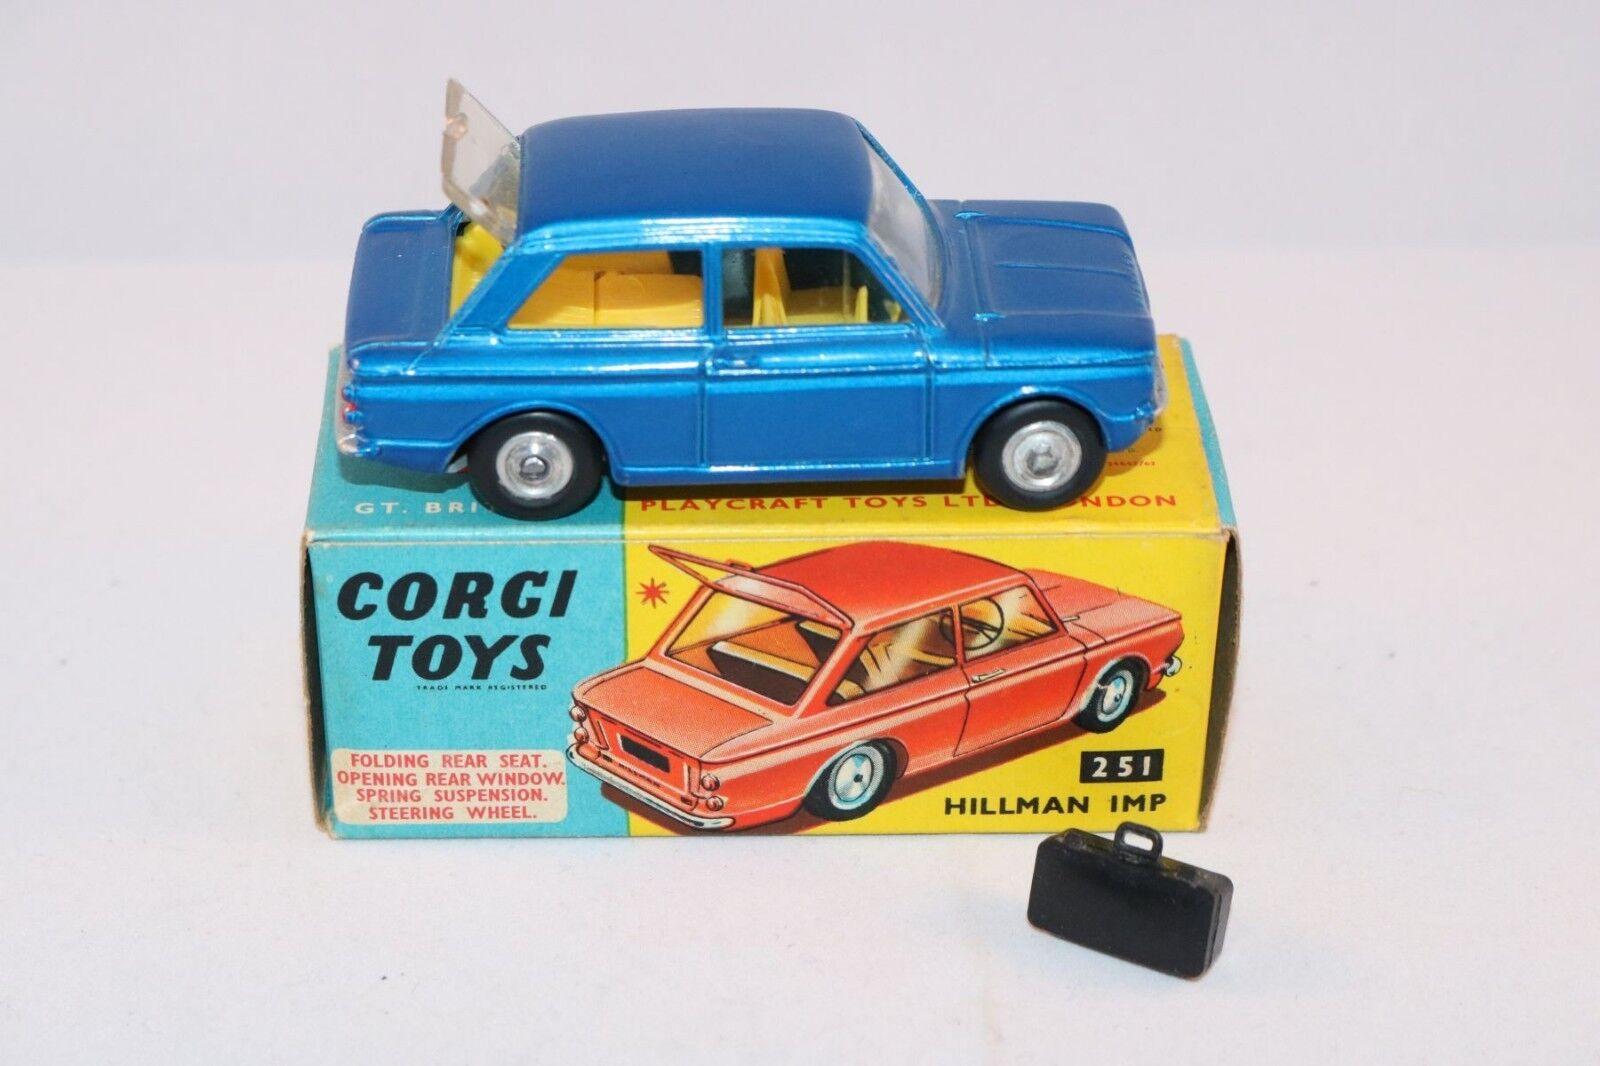 Corgi Toys 251 Hillman IMP blu perfect mint in box SUPERB